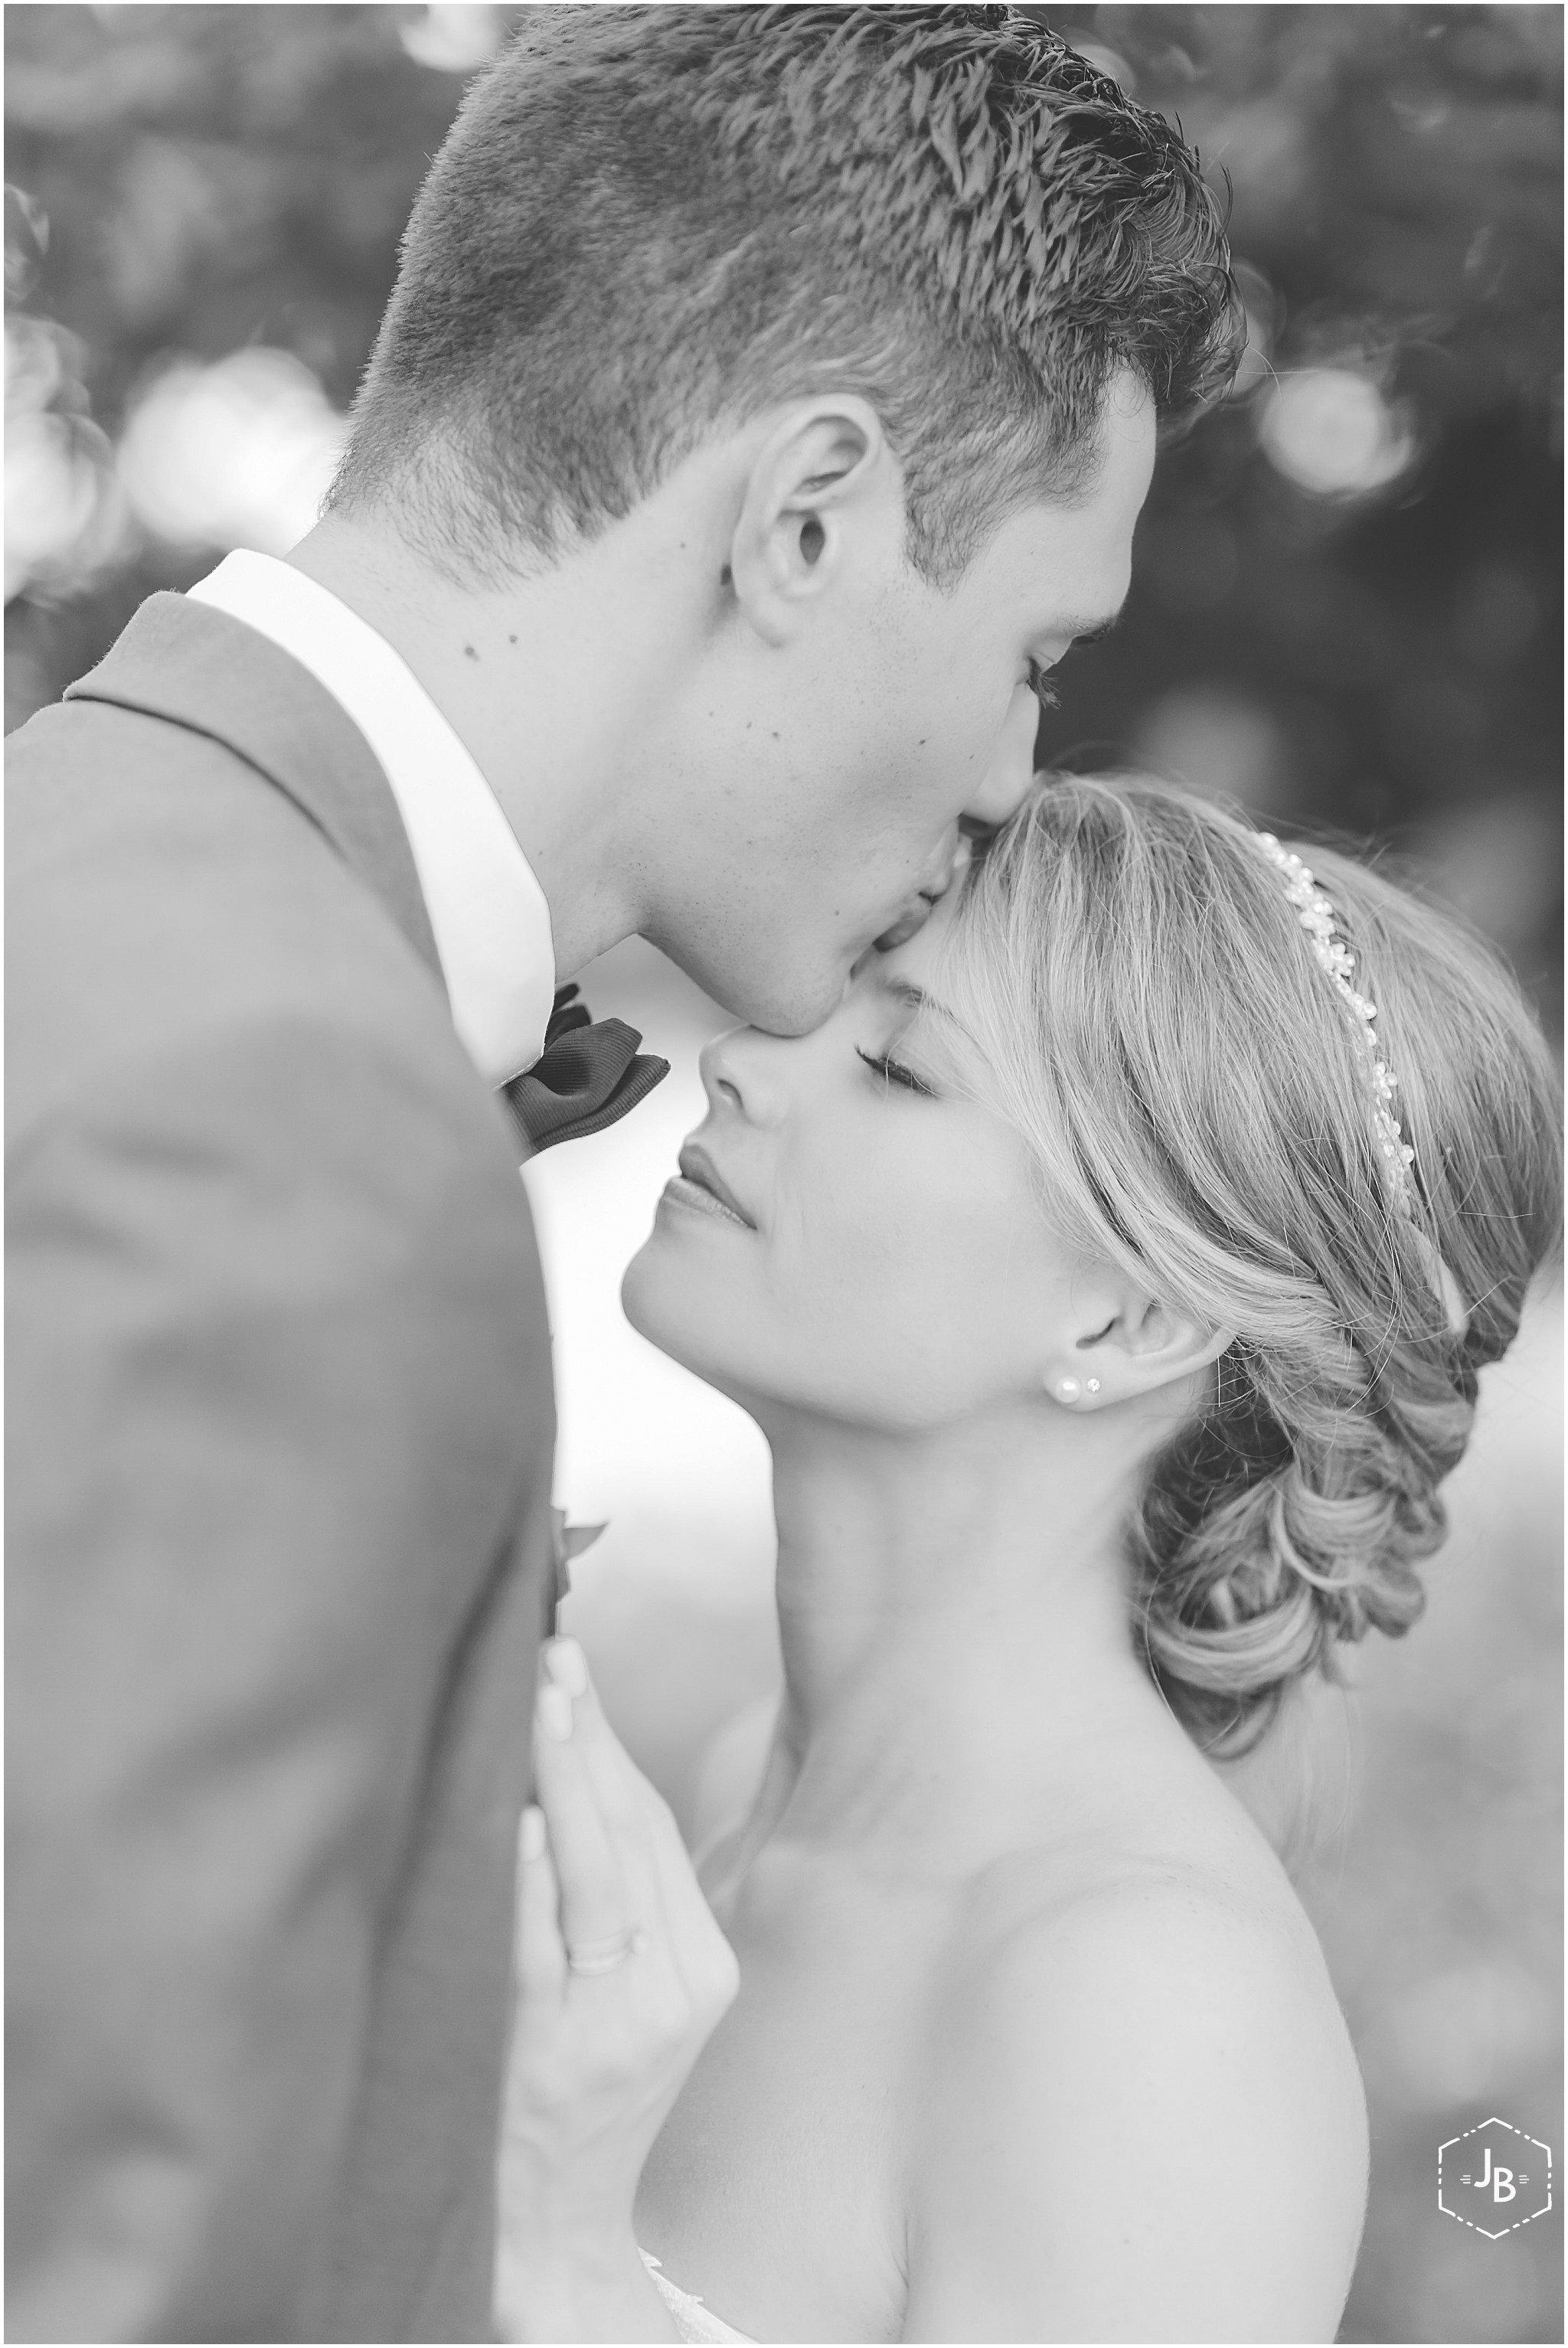 WeddingandEngagementFloridaPhotographer_0366.jpg